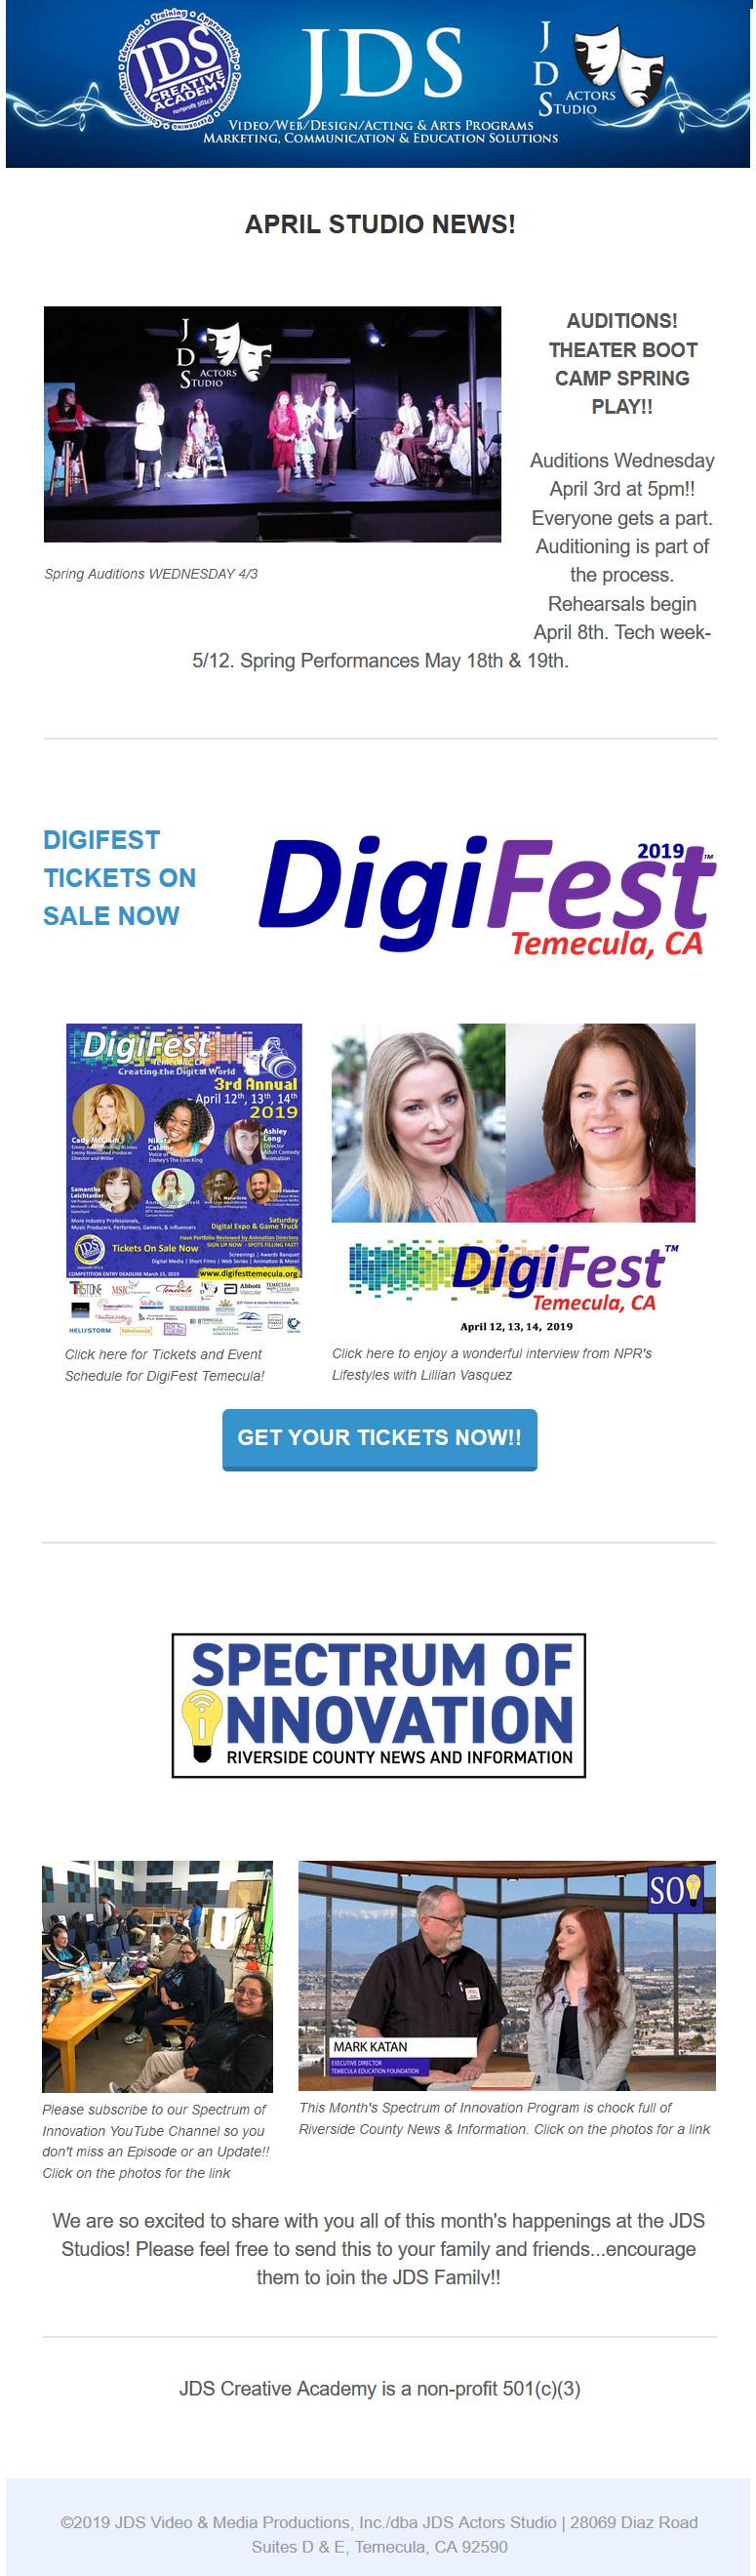 The Latest JDS News & Info...DigiFest & Auditions